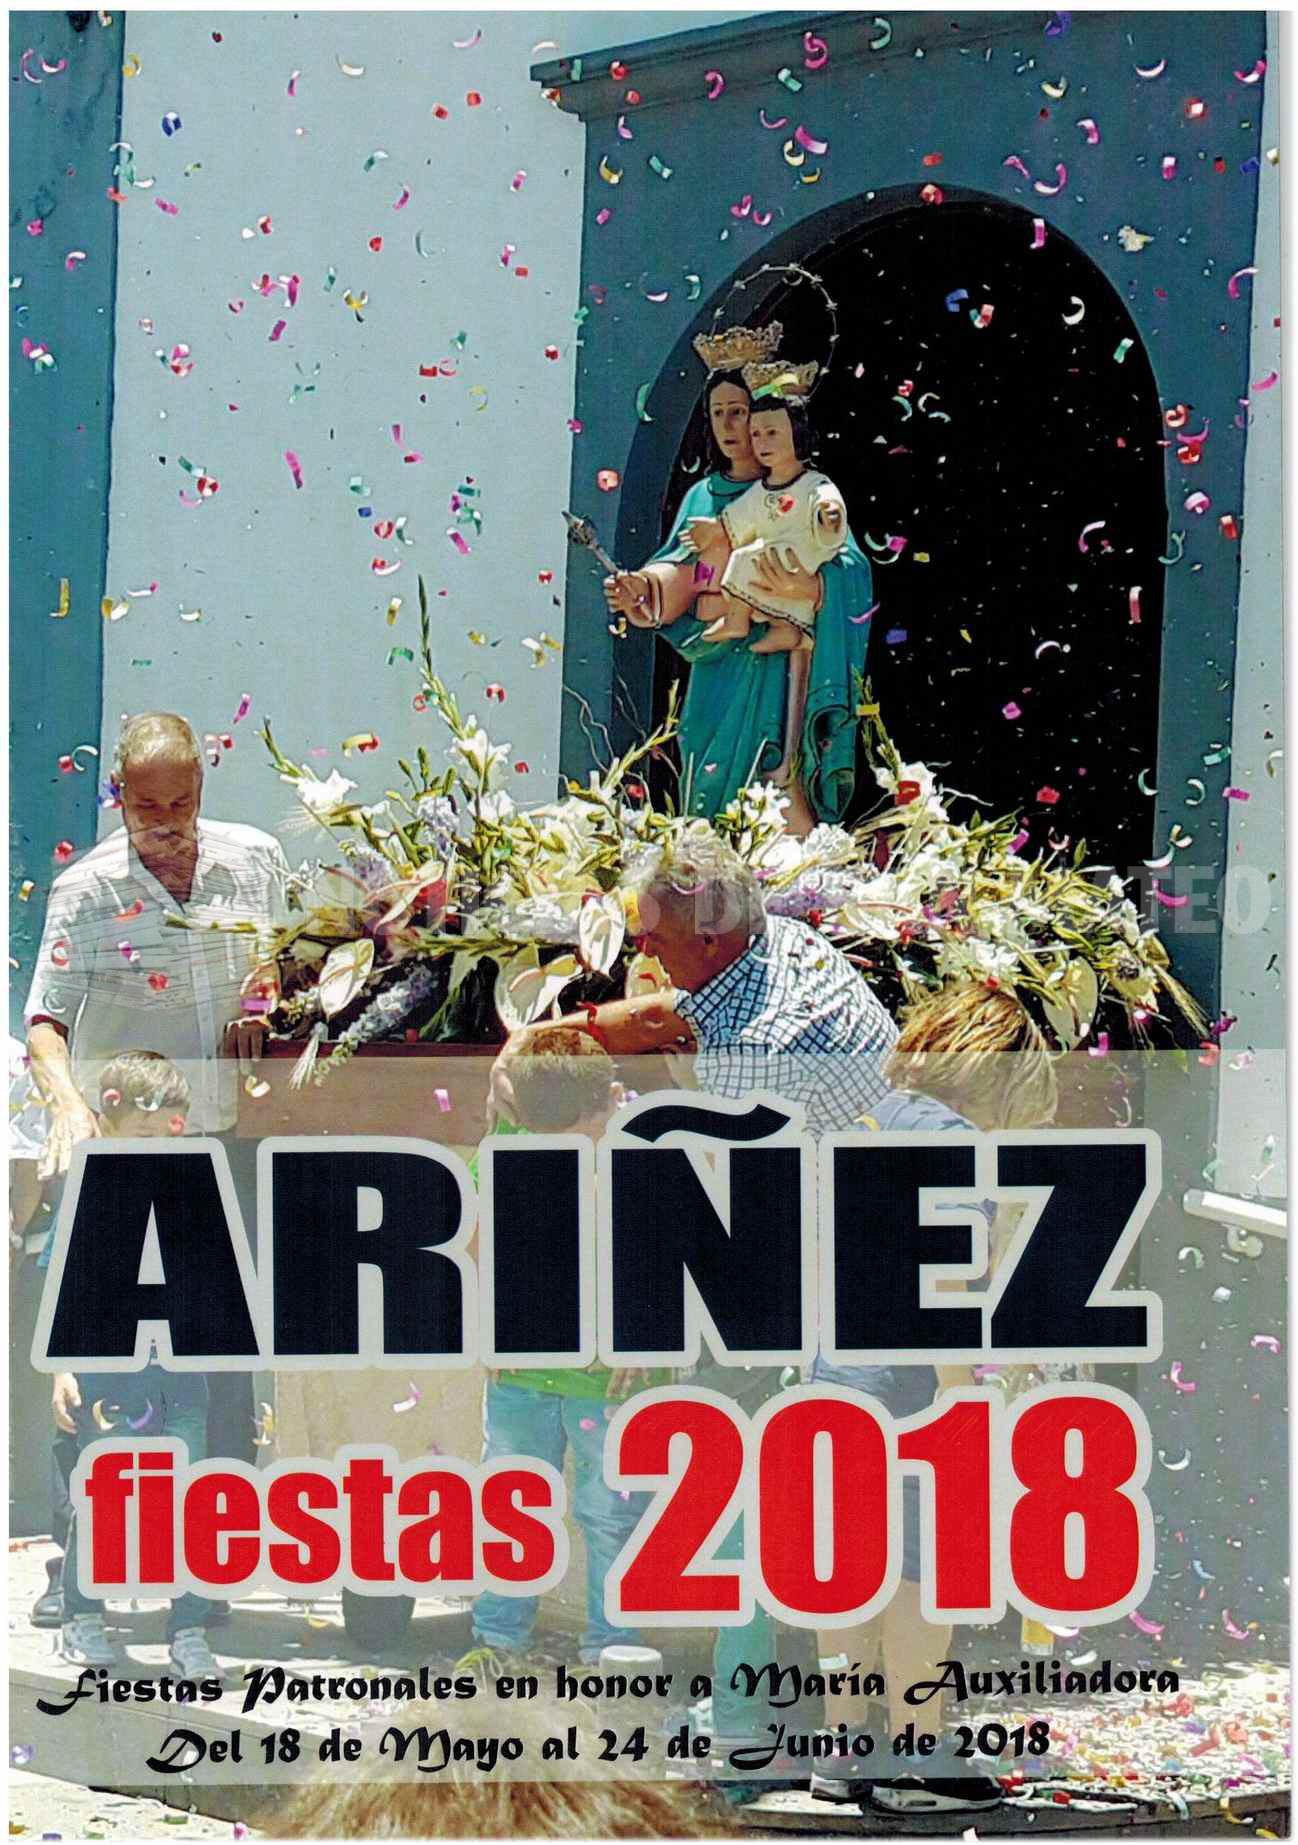 portada arinez1